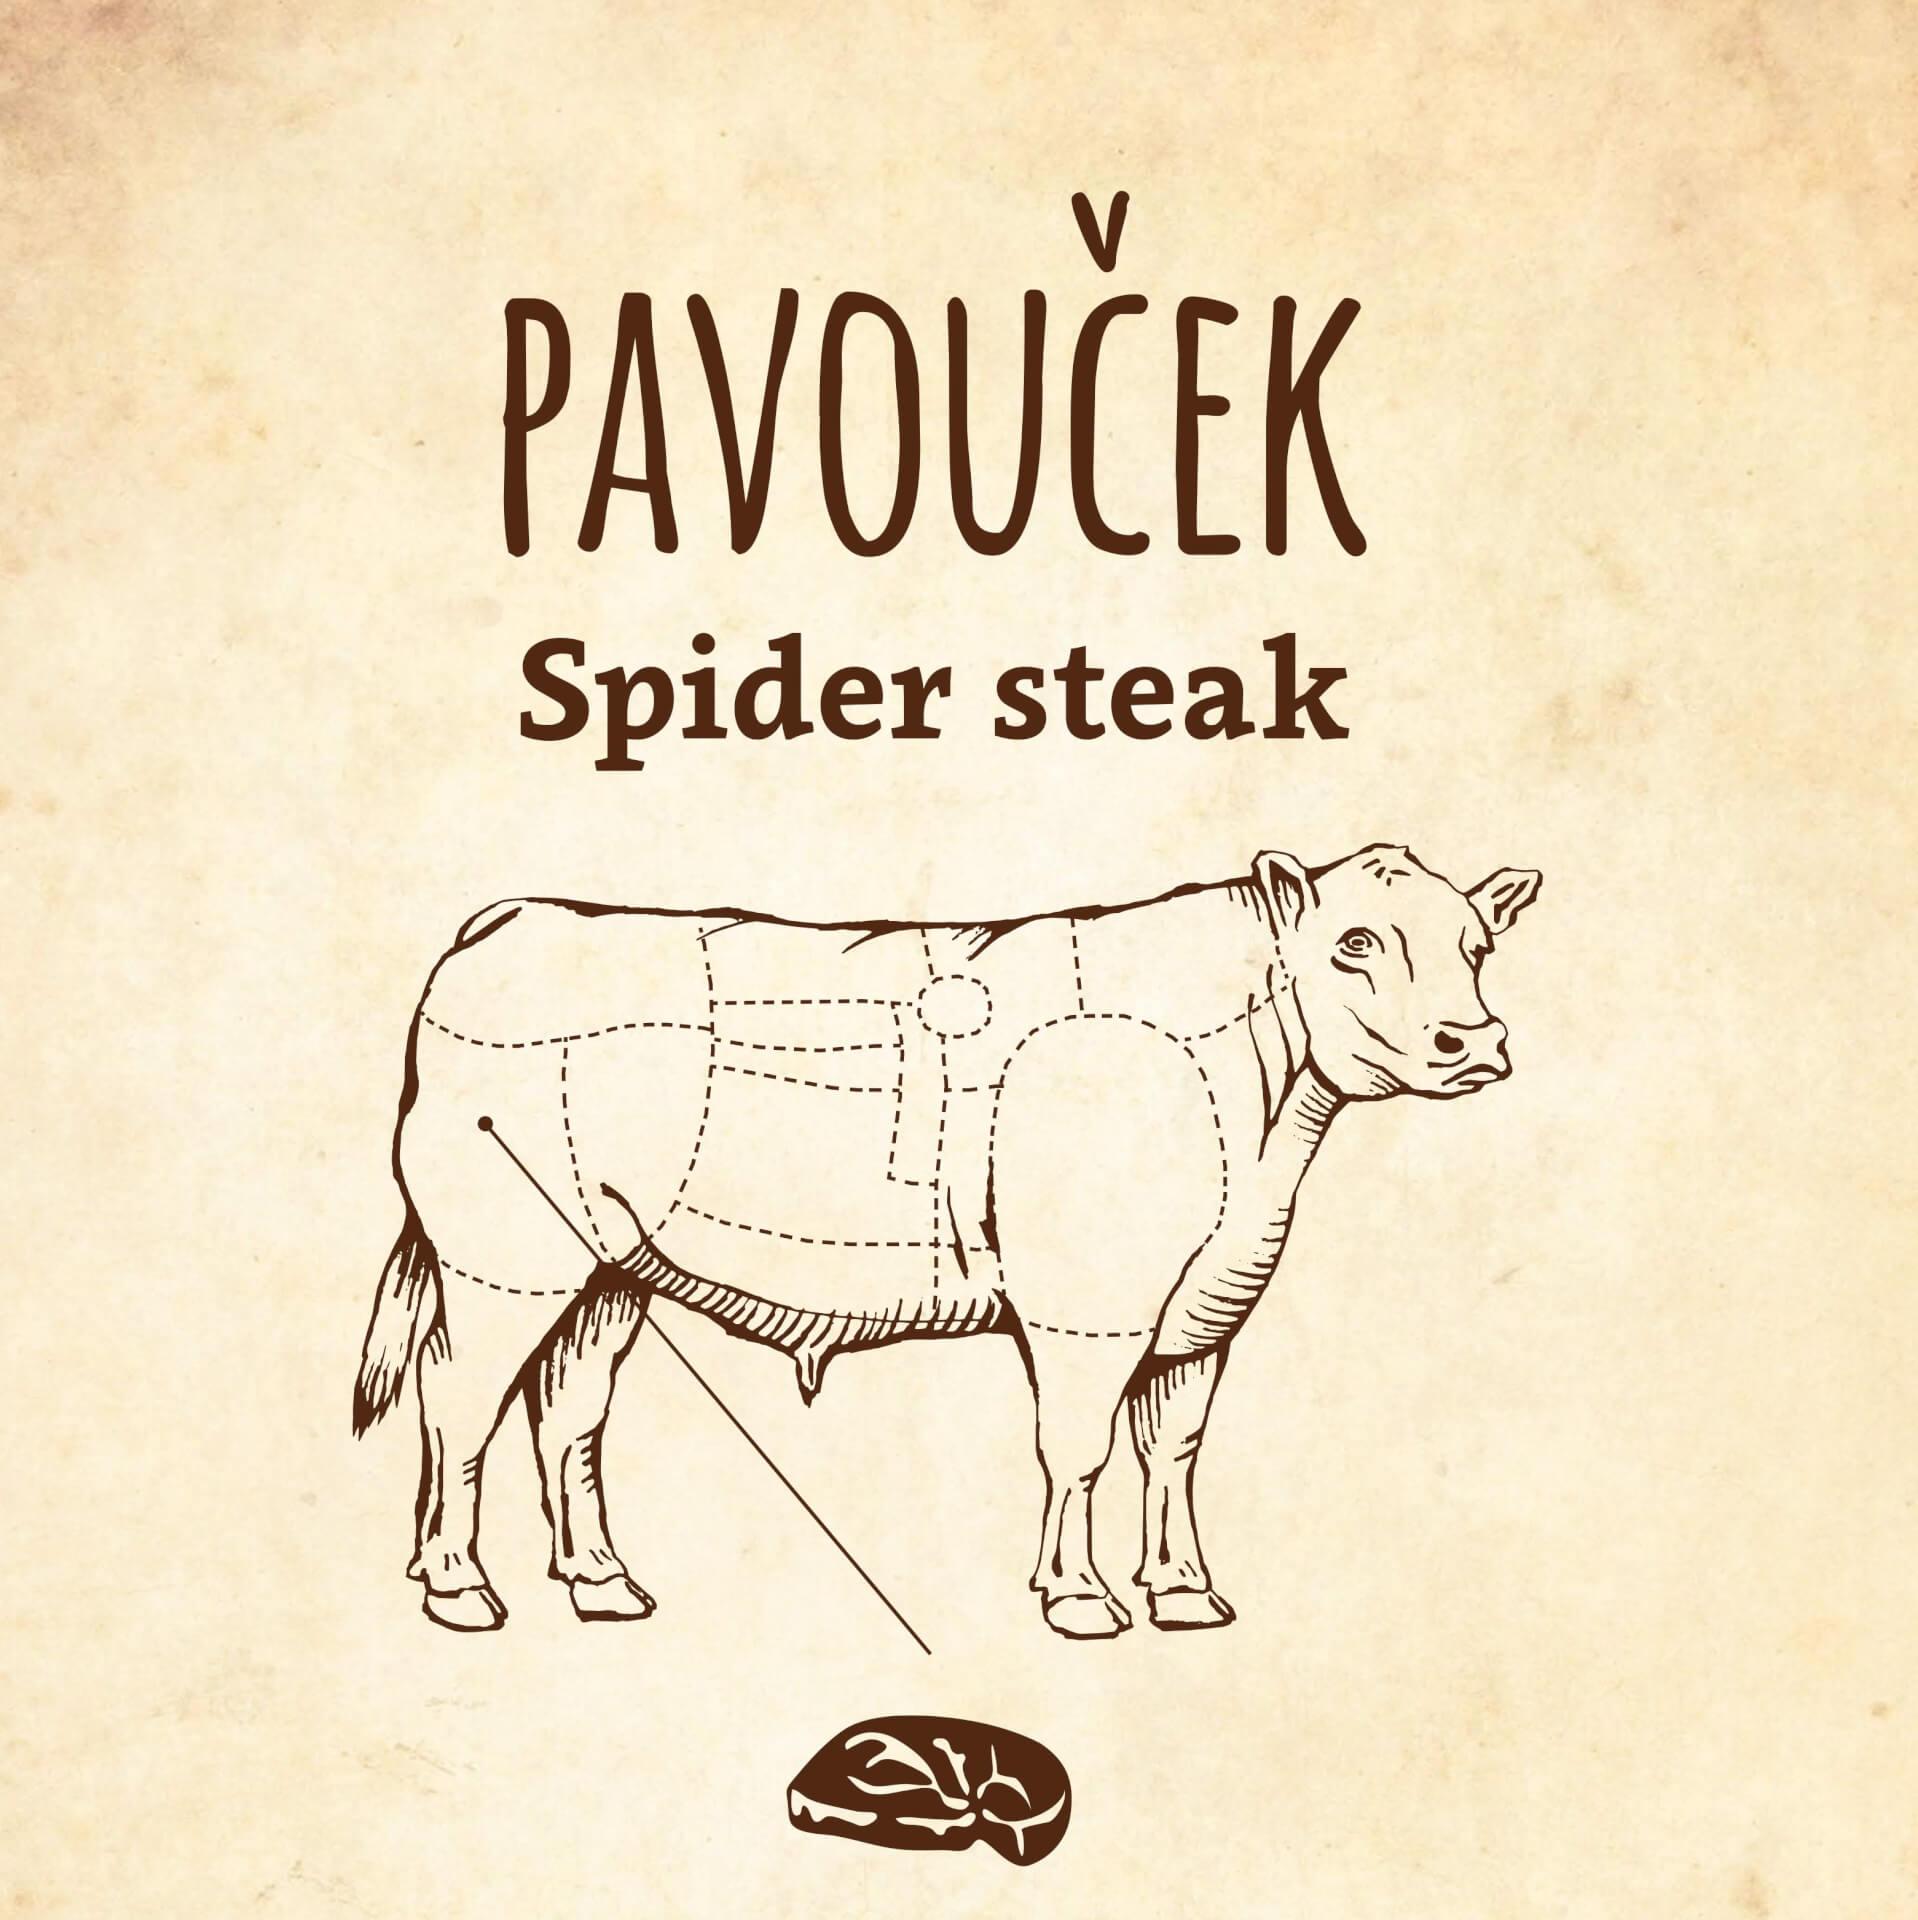 Spider steak / Pavouček